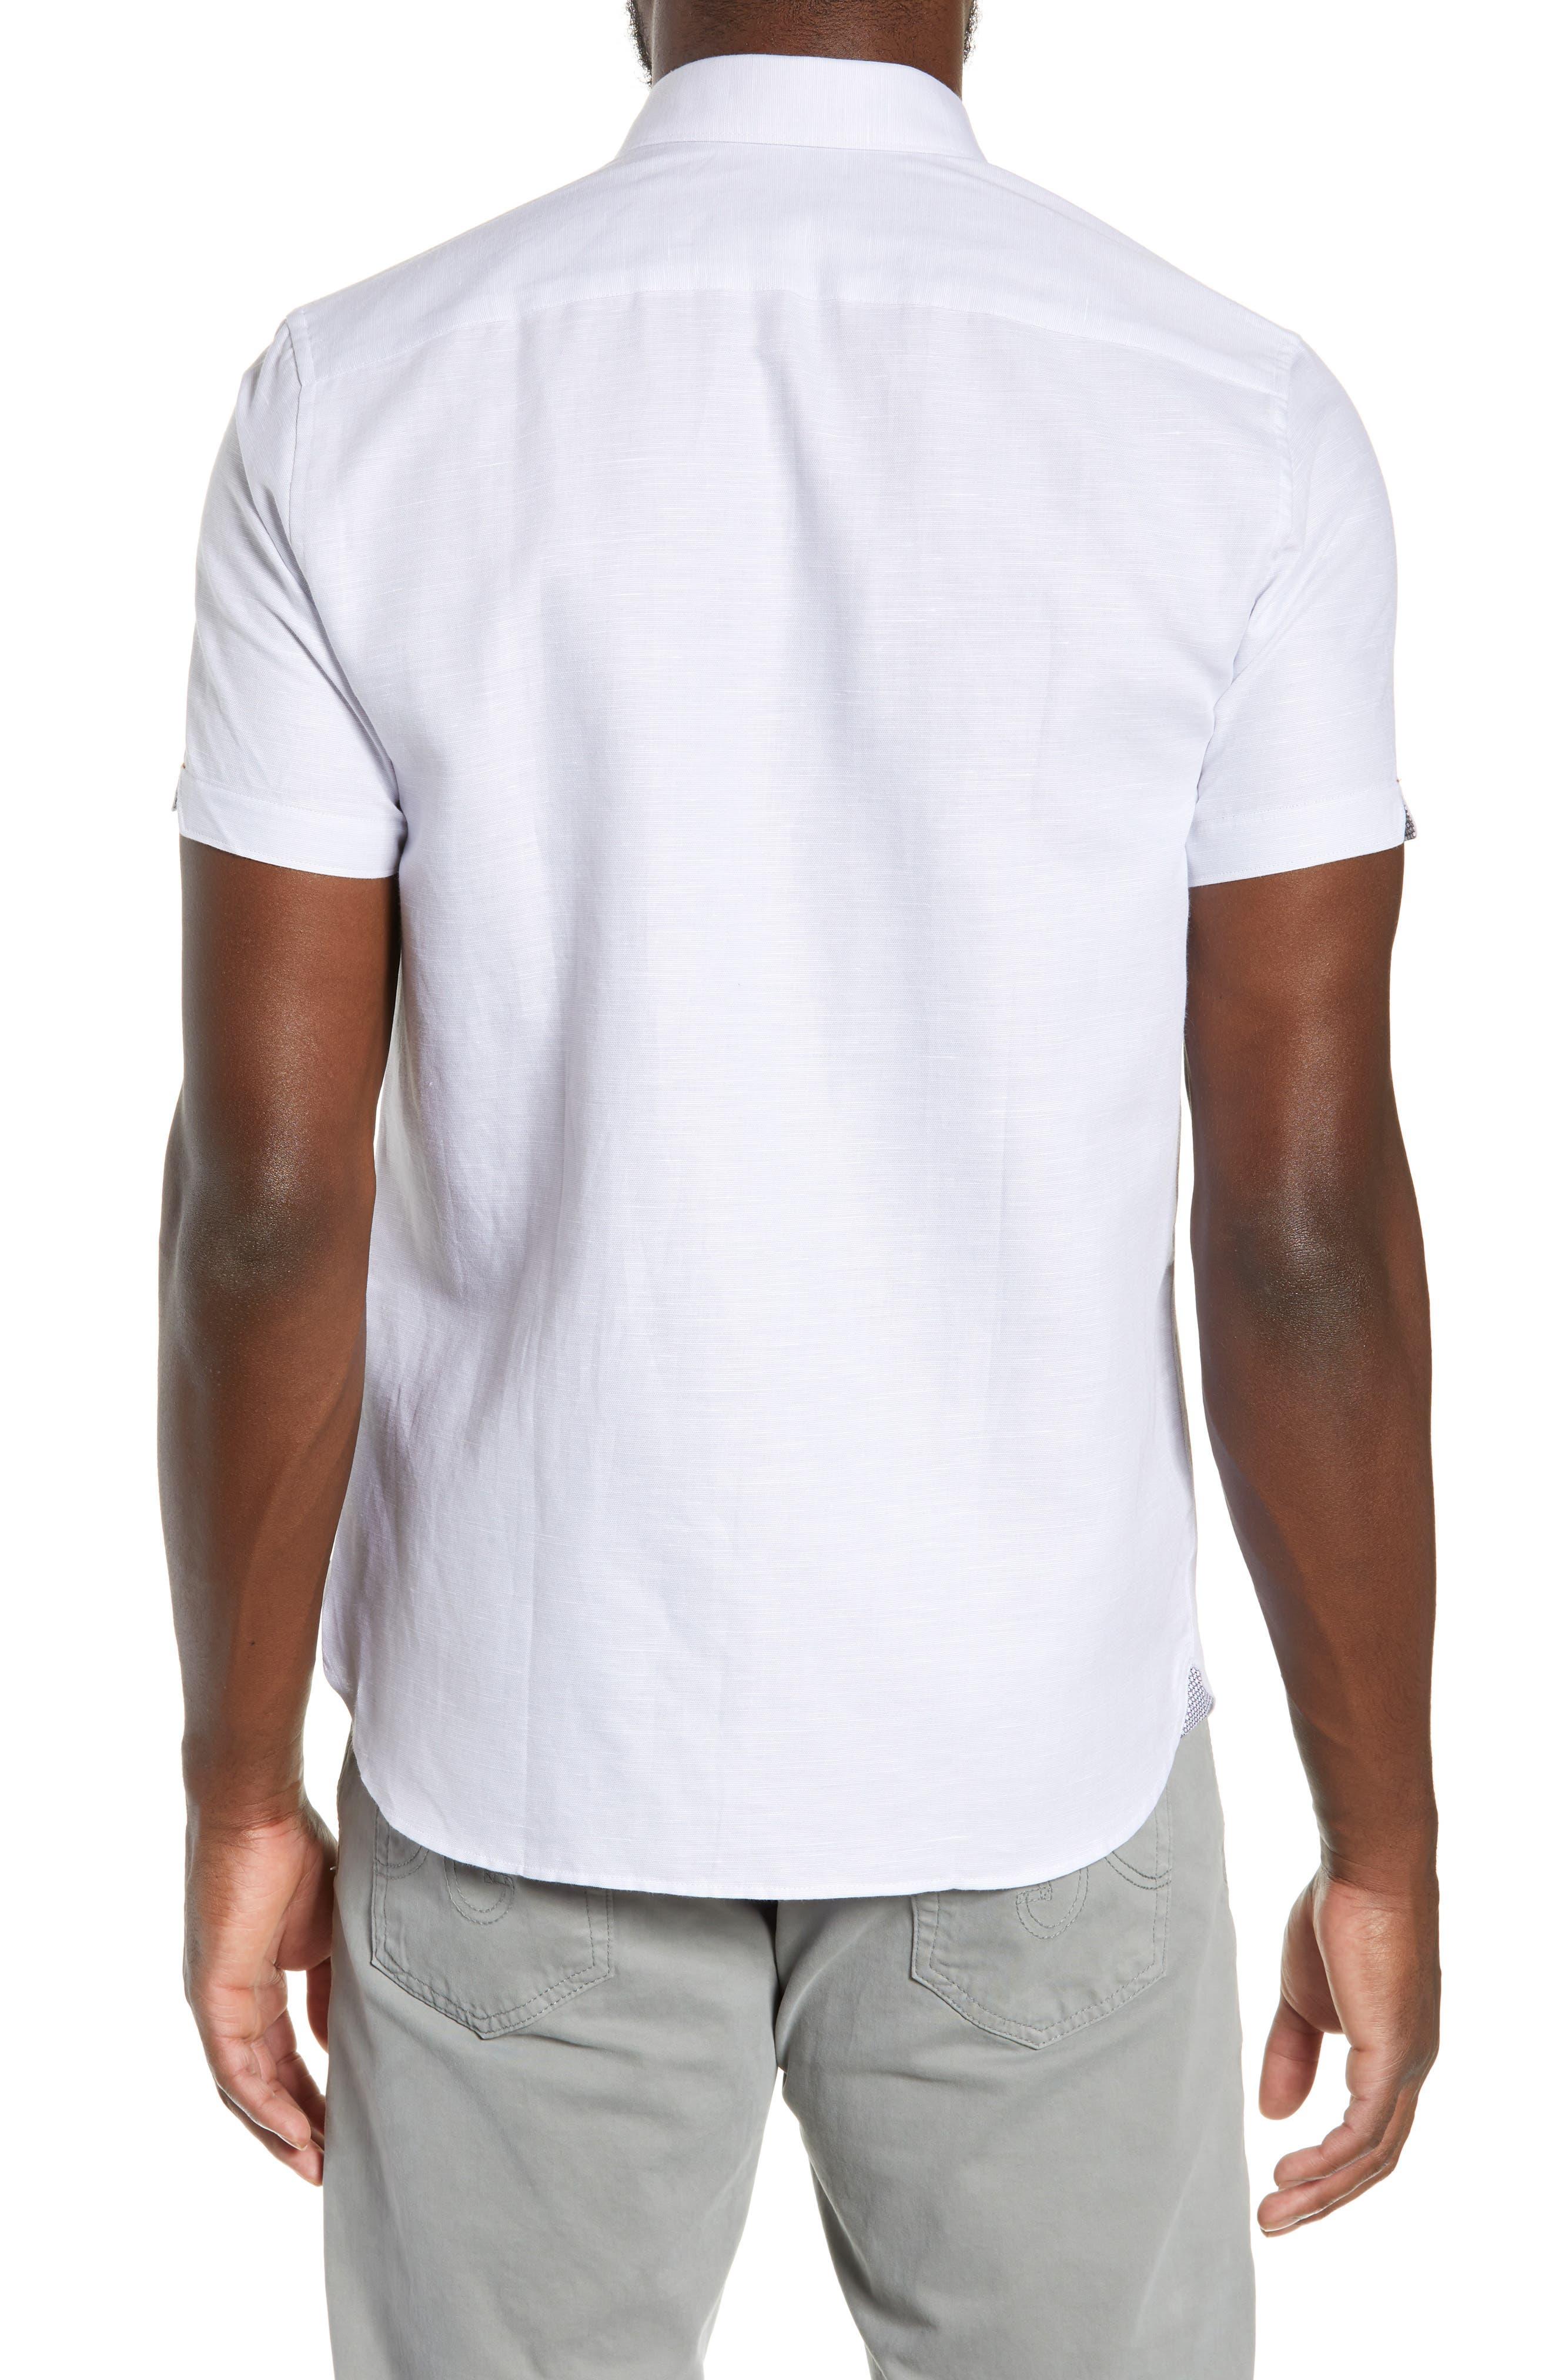 TED BAKER LONDON, Graphit Slim Fit Cotton & Linen Sport Shirt, Alternate thumbnail 3, color, GREY